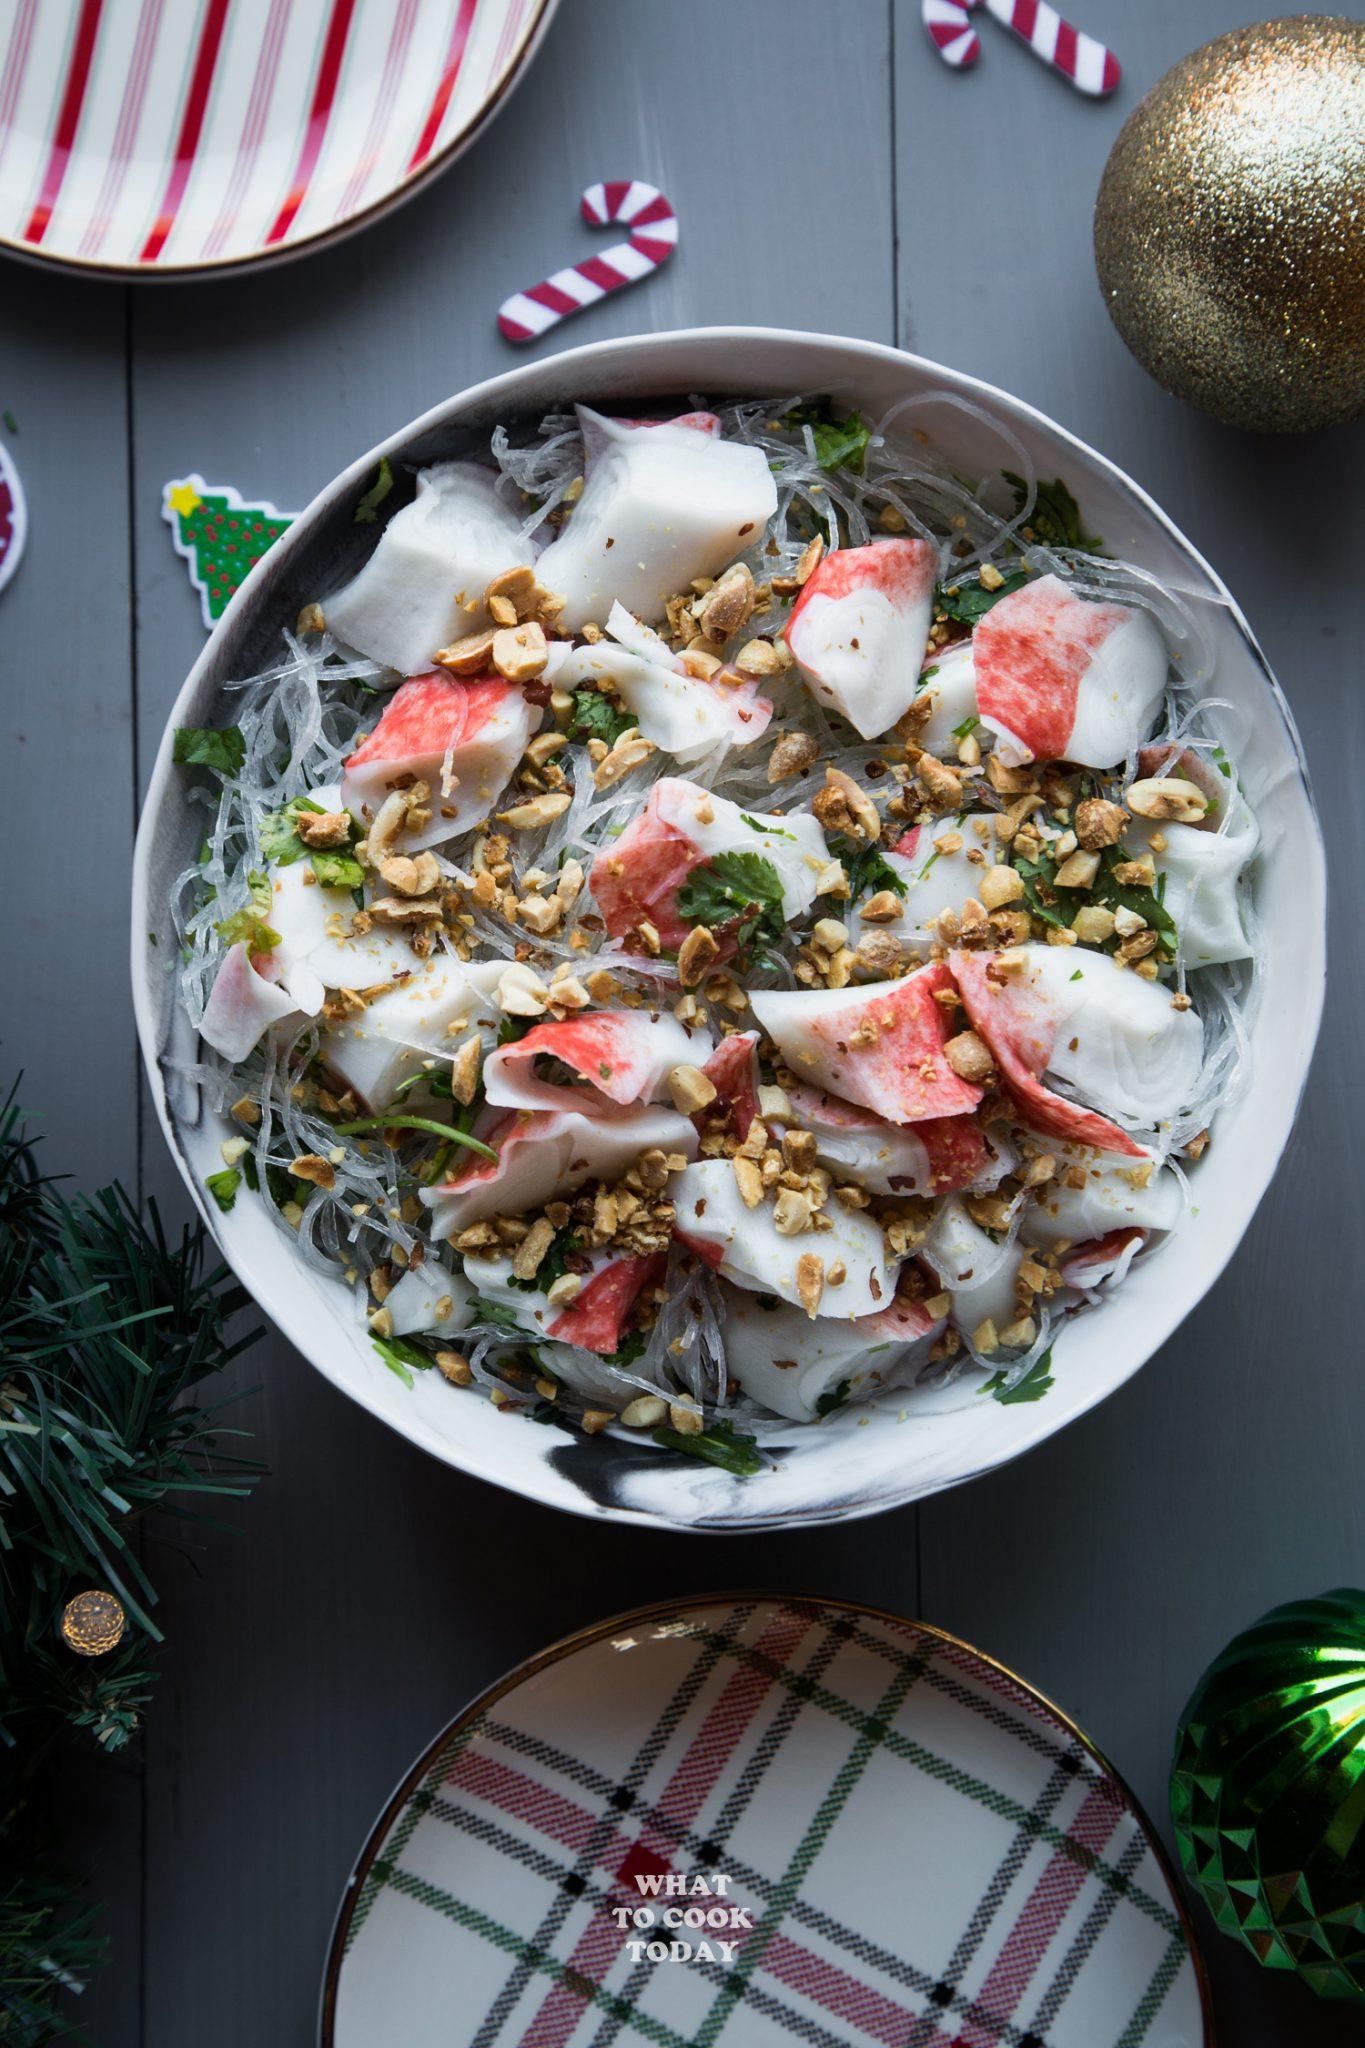 Surimi Cellophane Noodle Salad #ad #CrabDelightfulHoliday #surimi #noodlesalad #cellophane